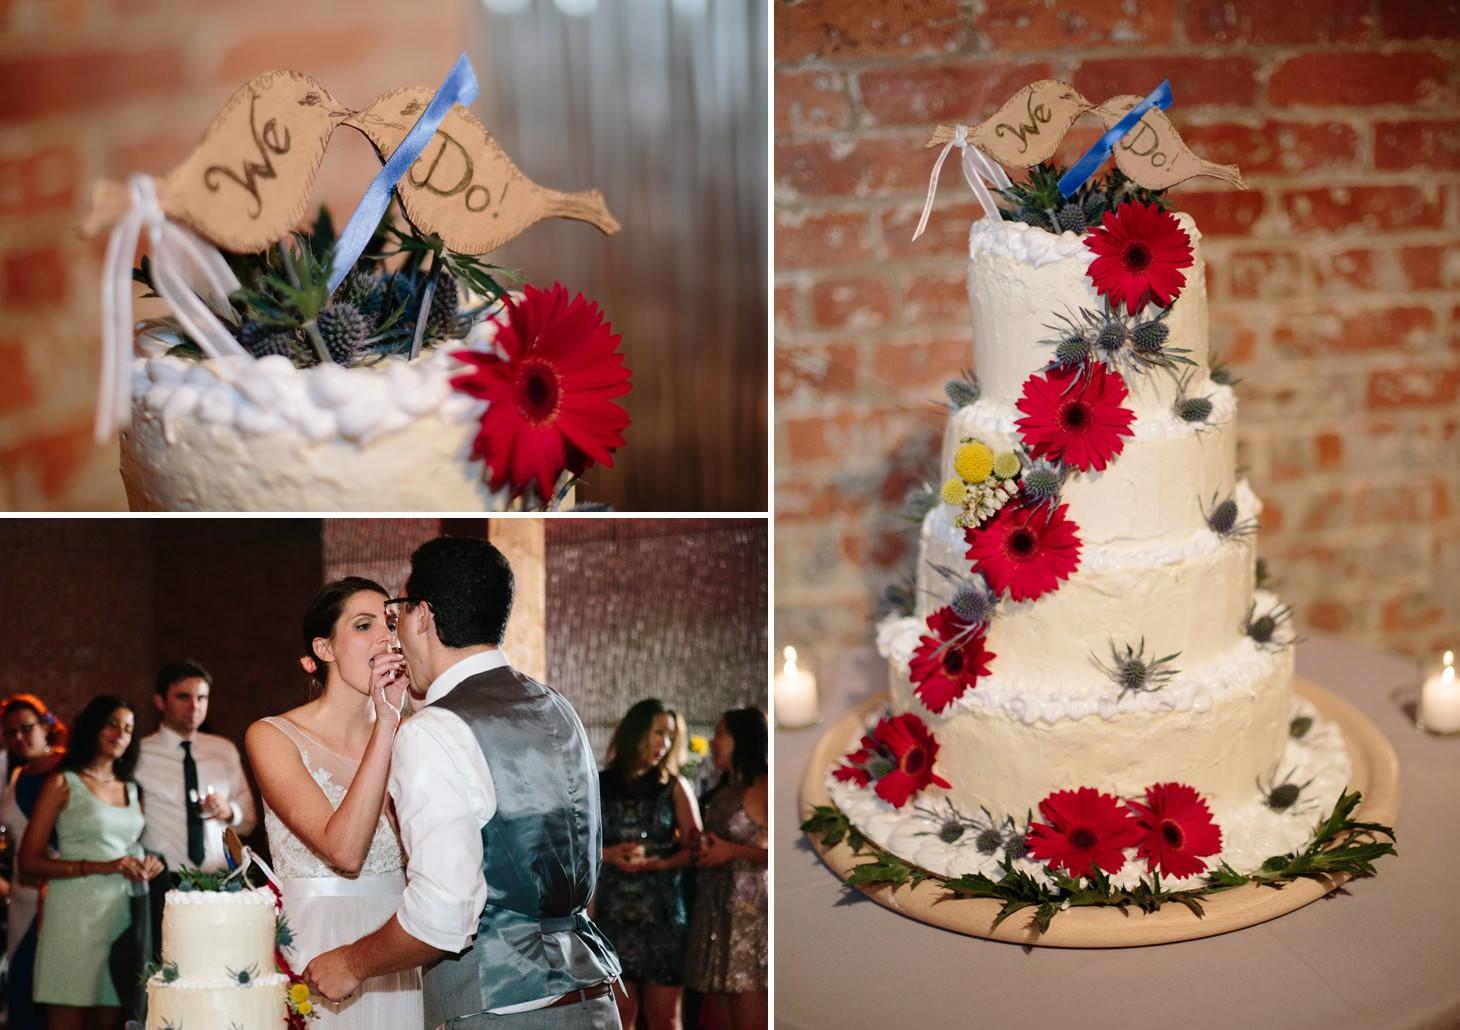 046-nyc-dumbo-loft-brooklyn-wedding-photographer-smitten-chickens-photo-.jpg